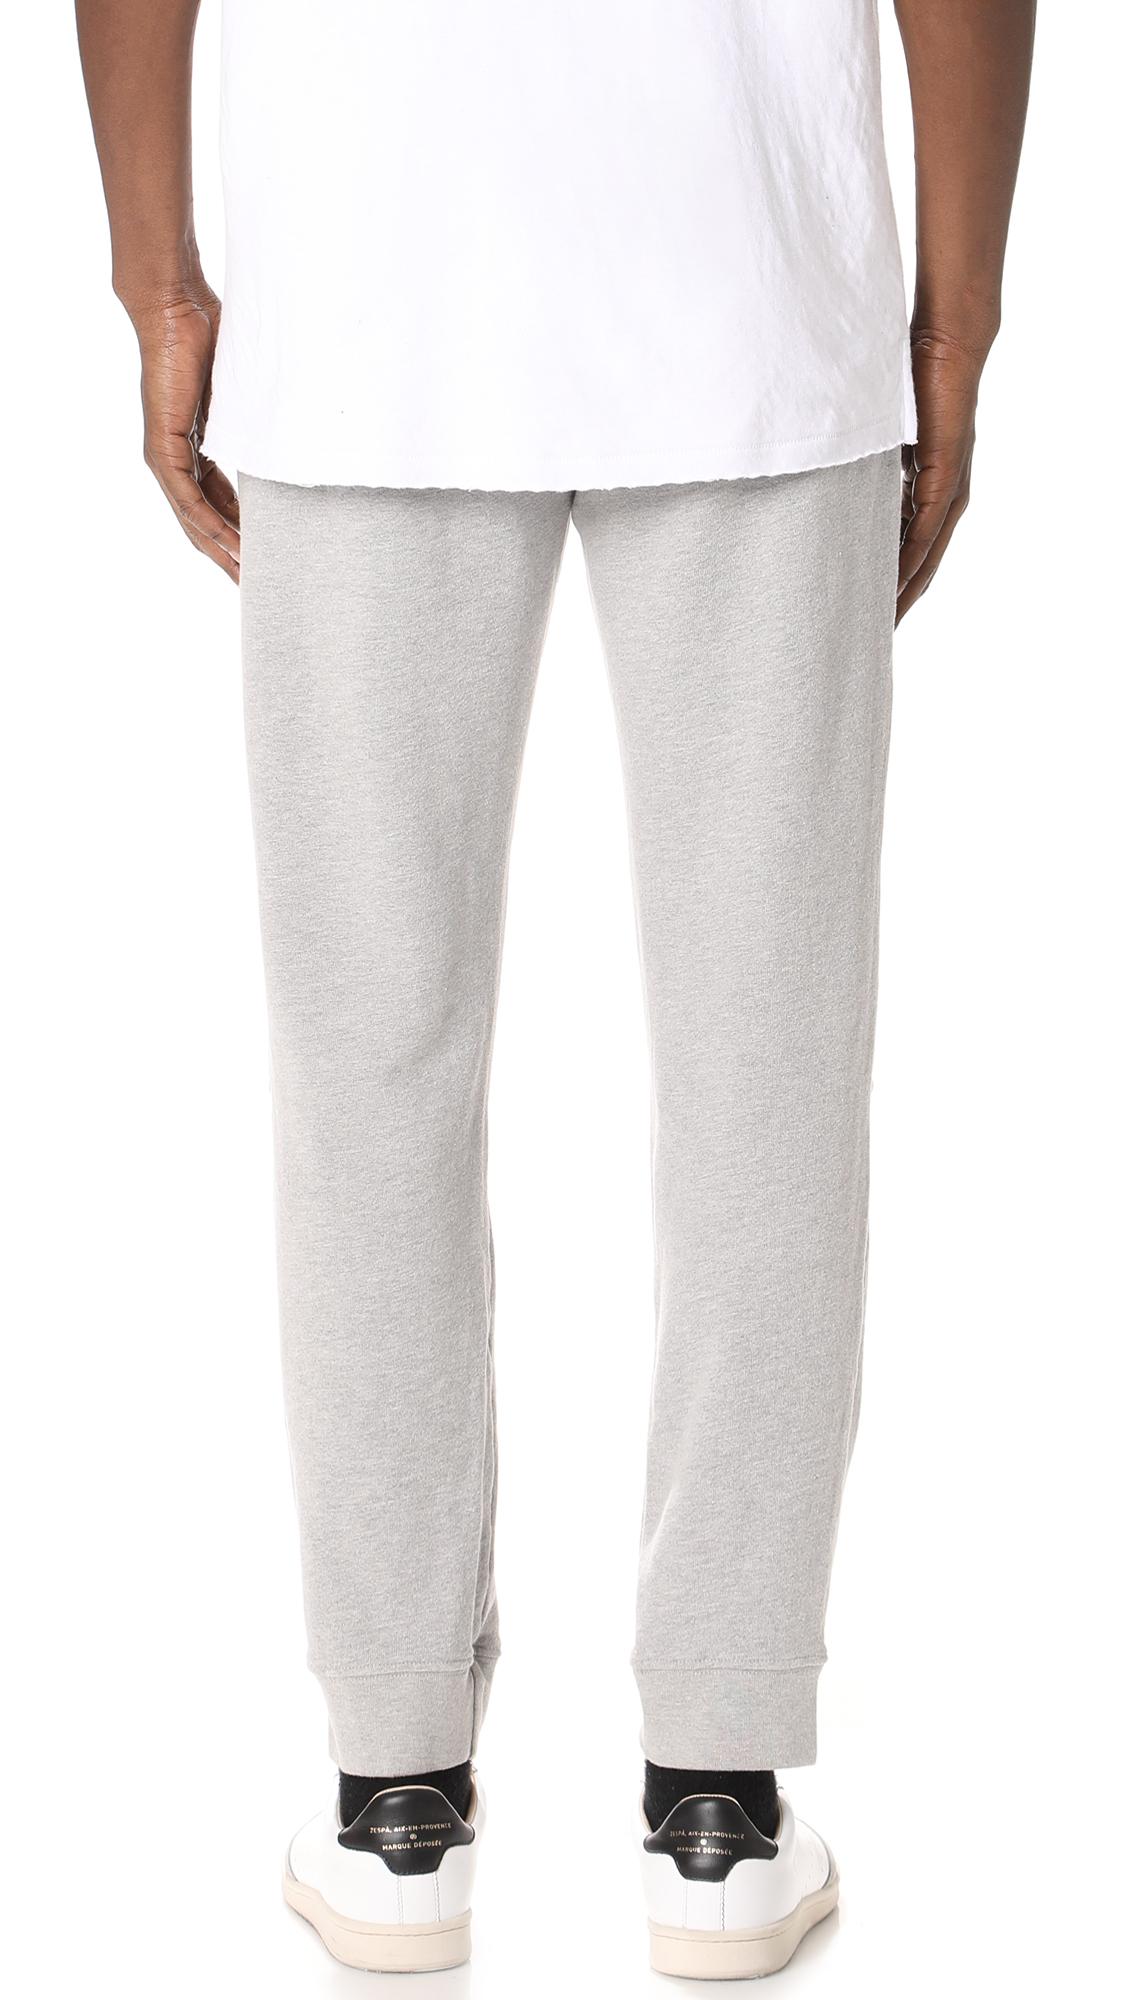 50a643d542f Velva Sheen Army Gym Sweatpants